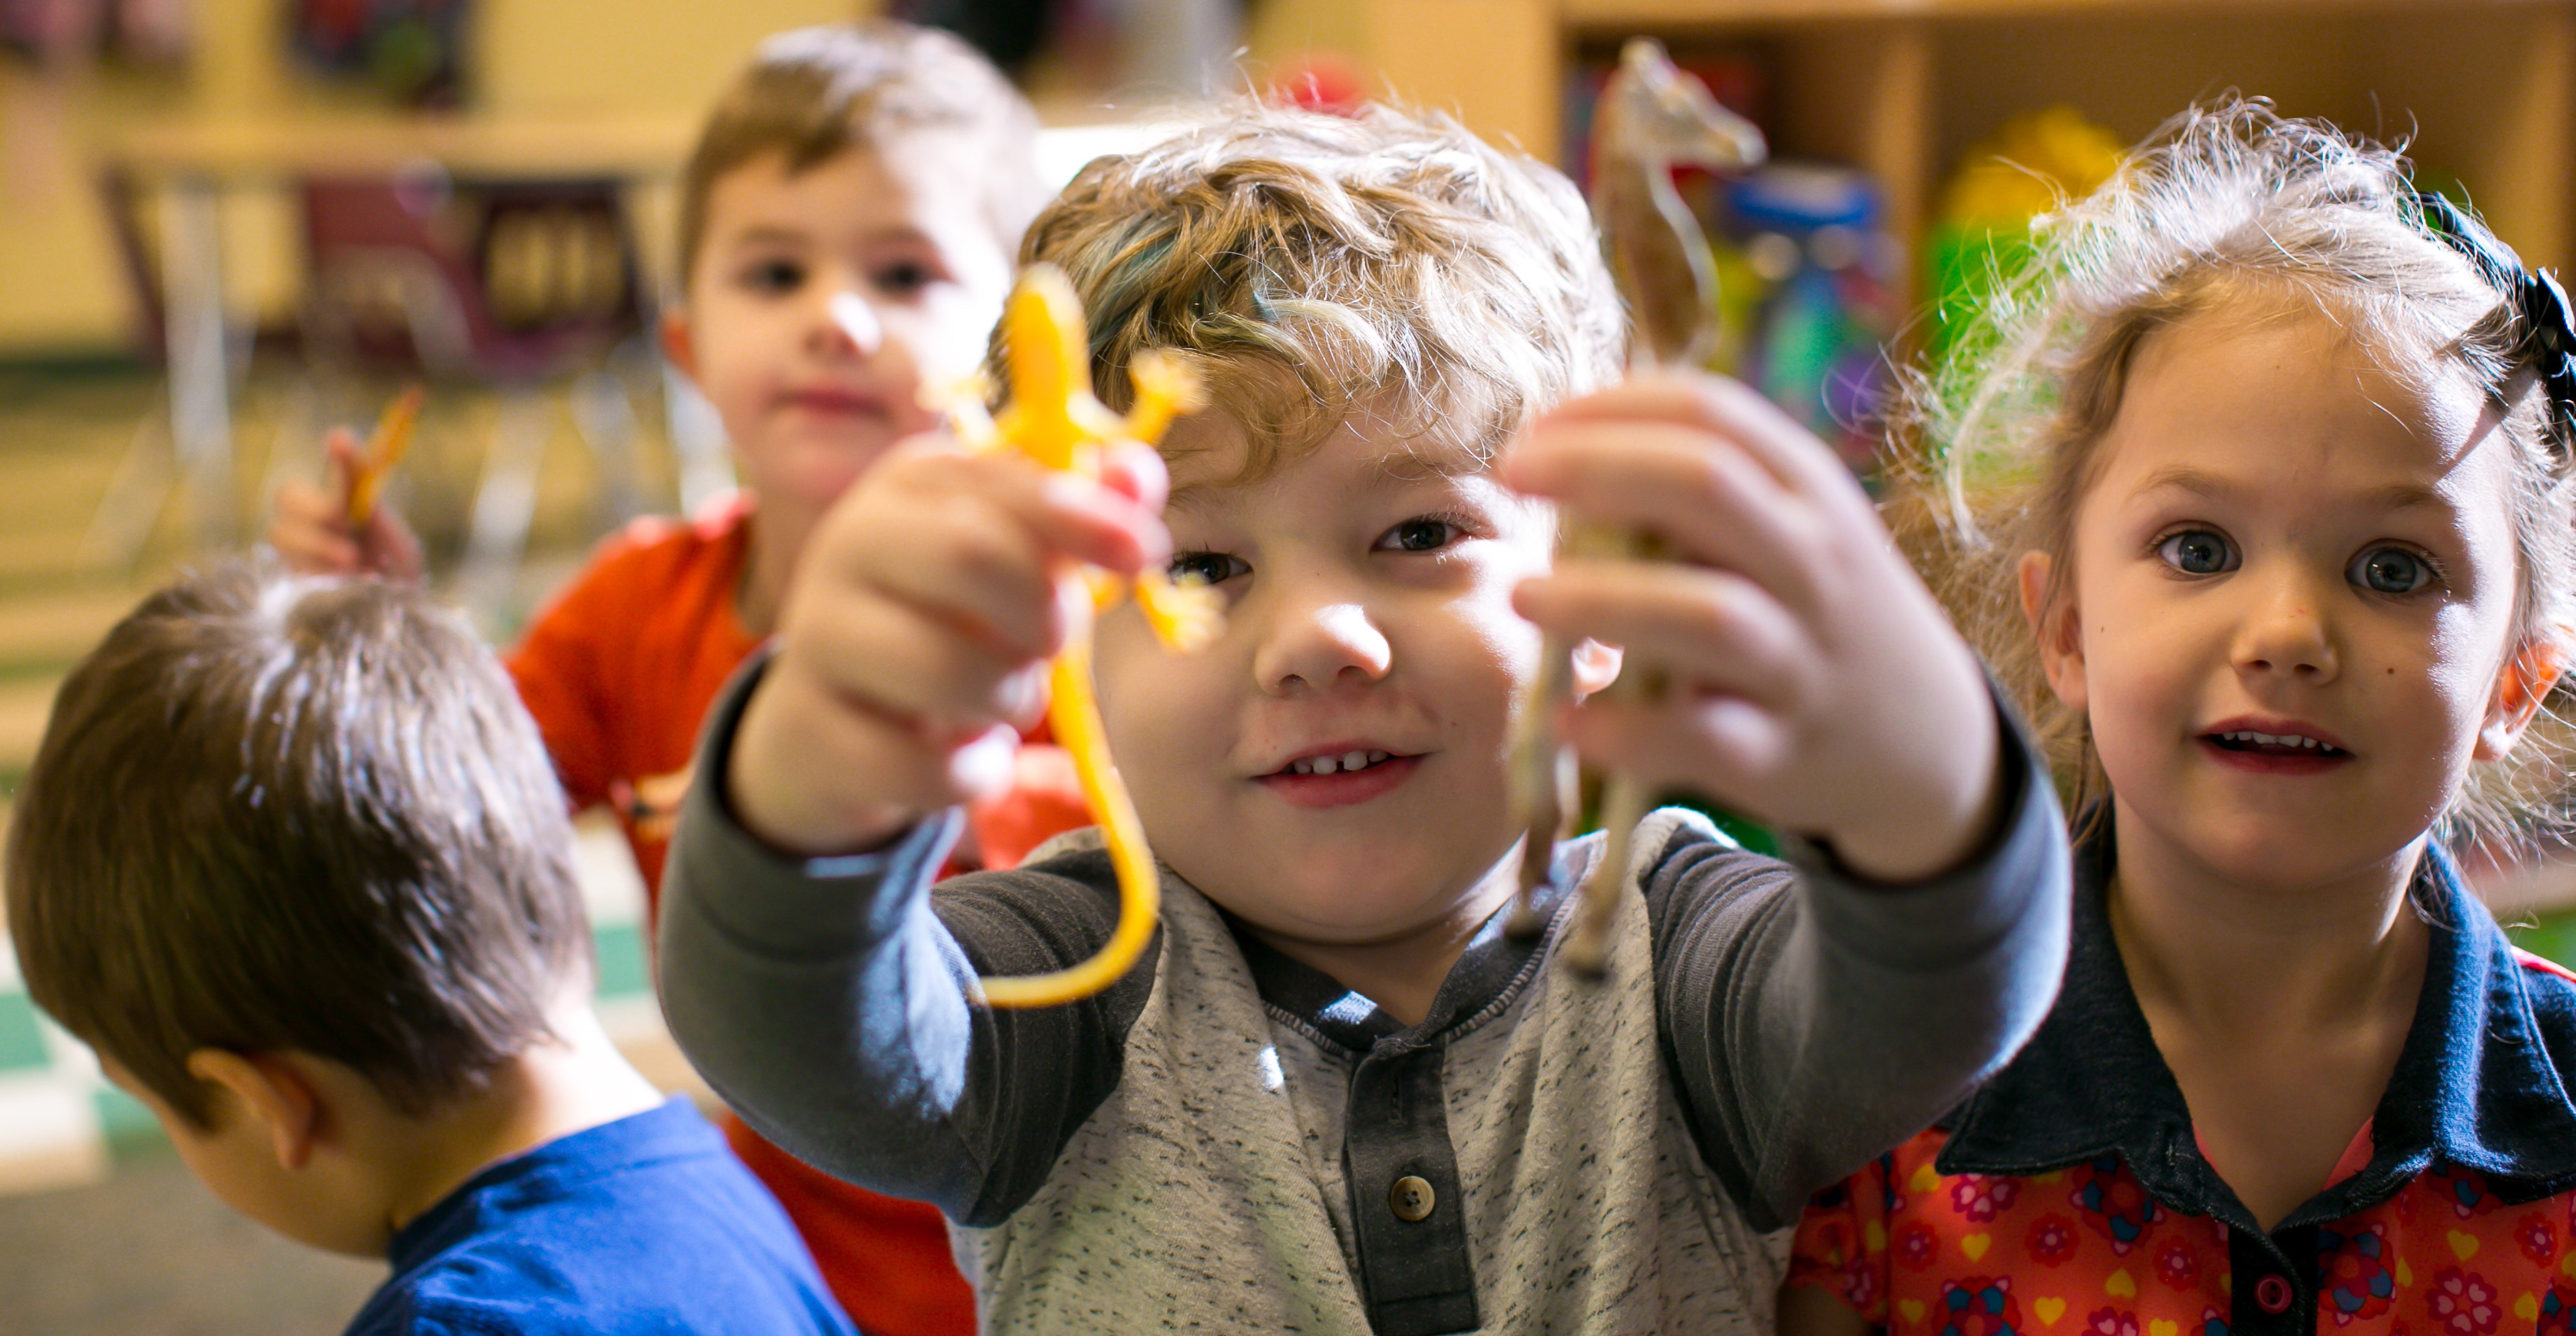 veritas preschool   Veritas Academy   Classical Christian School